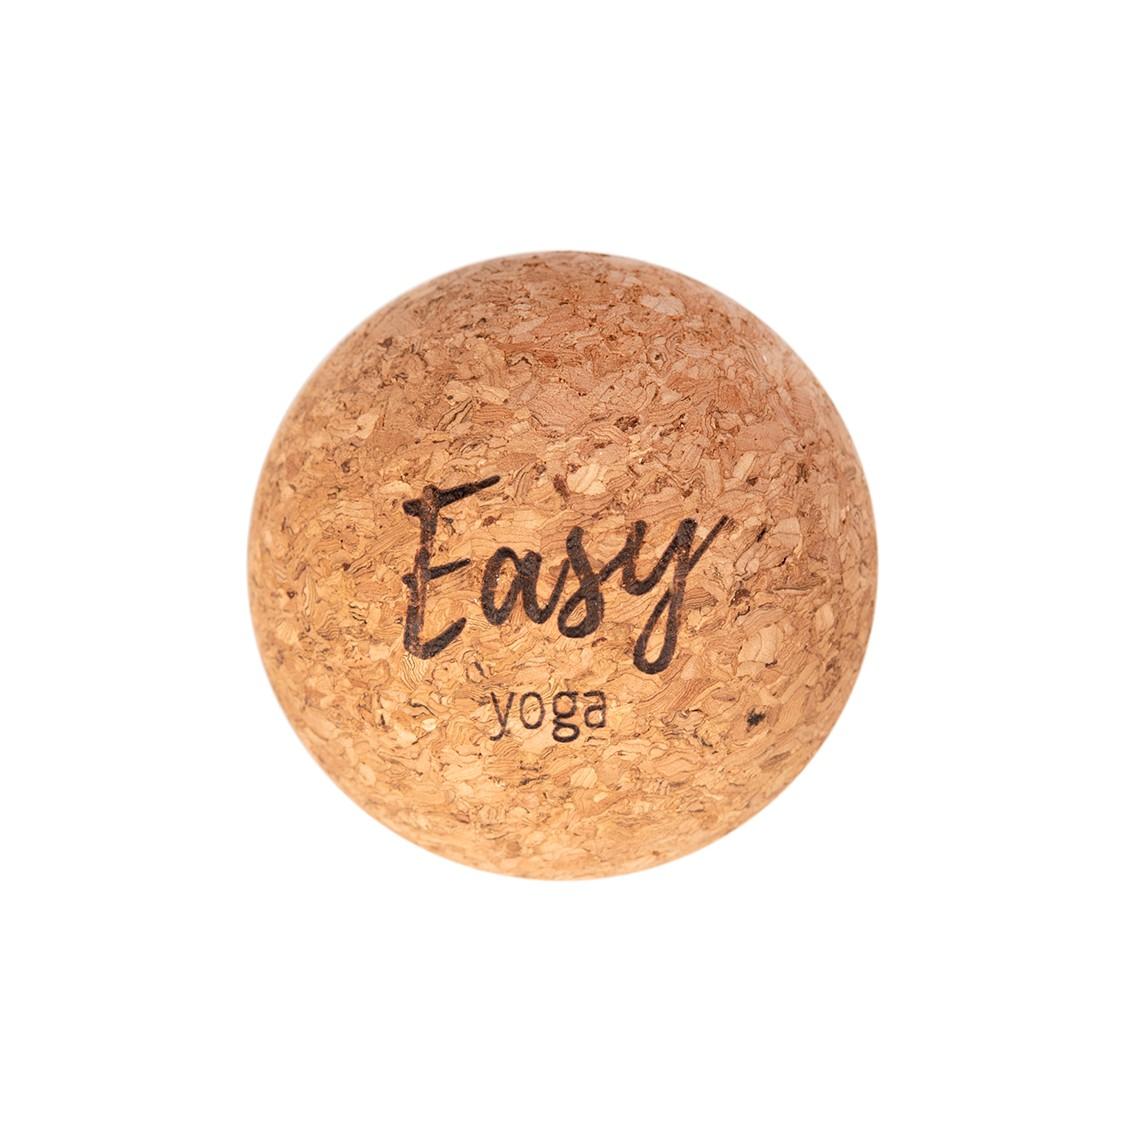 CORK MASSAGE BALL : Średnica - 6,5cm